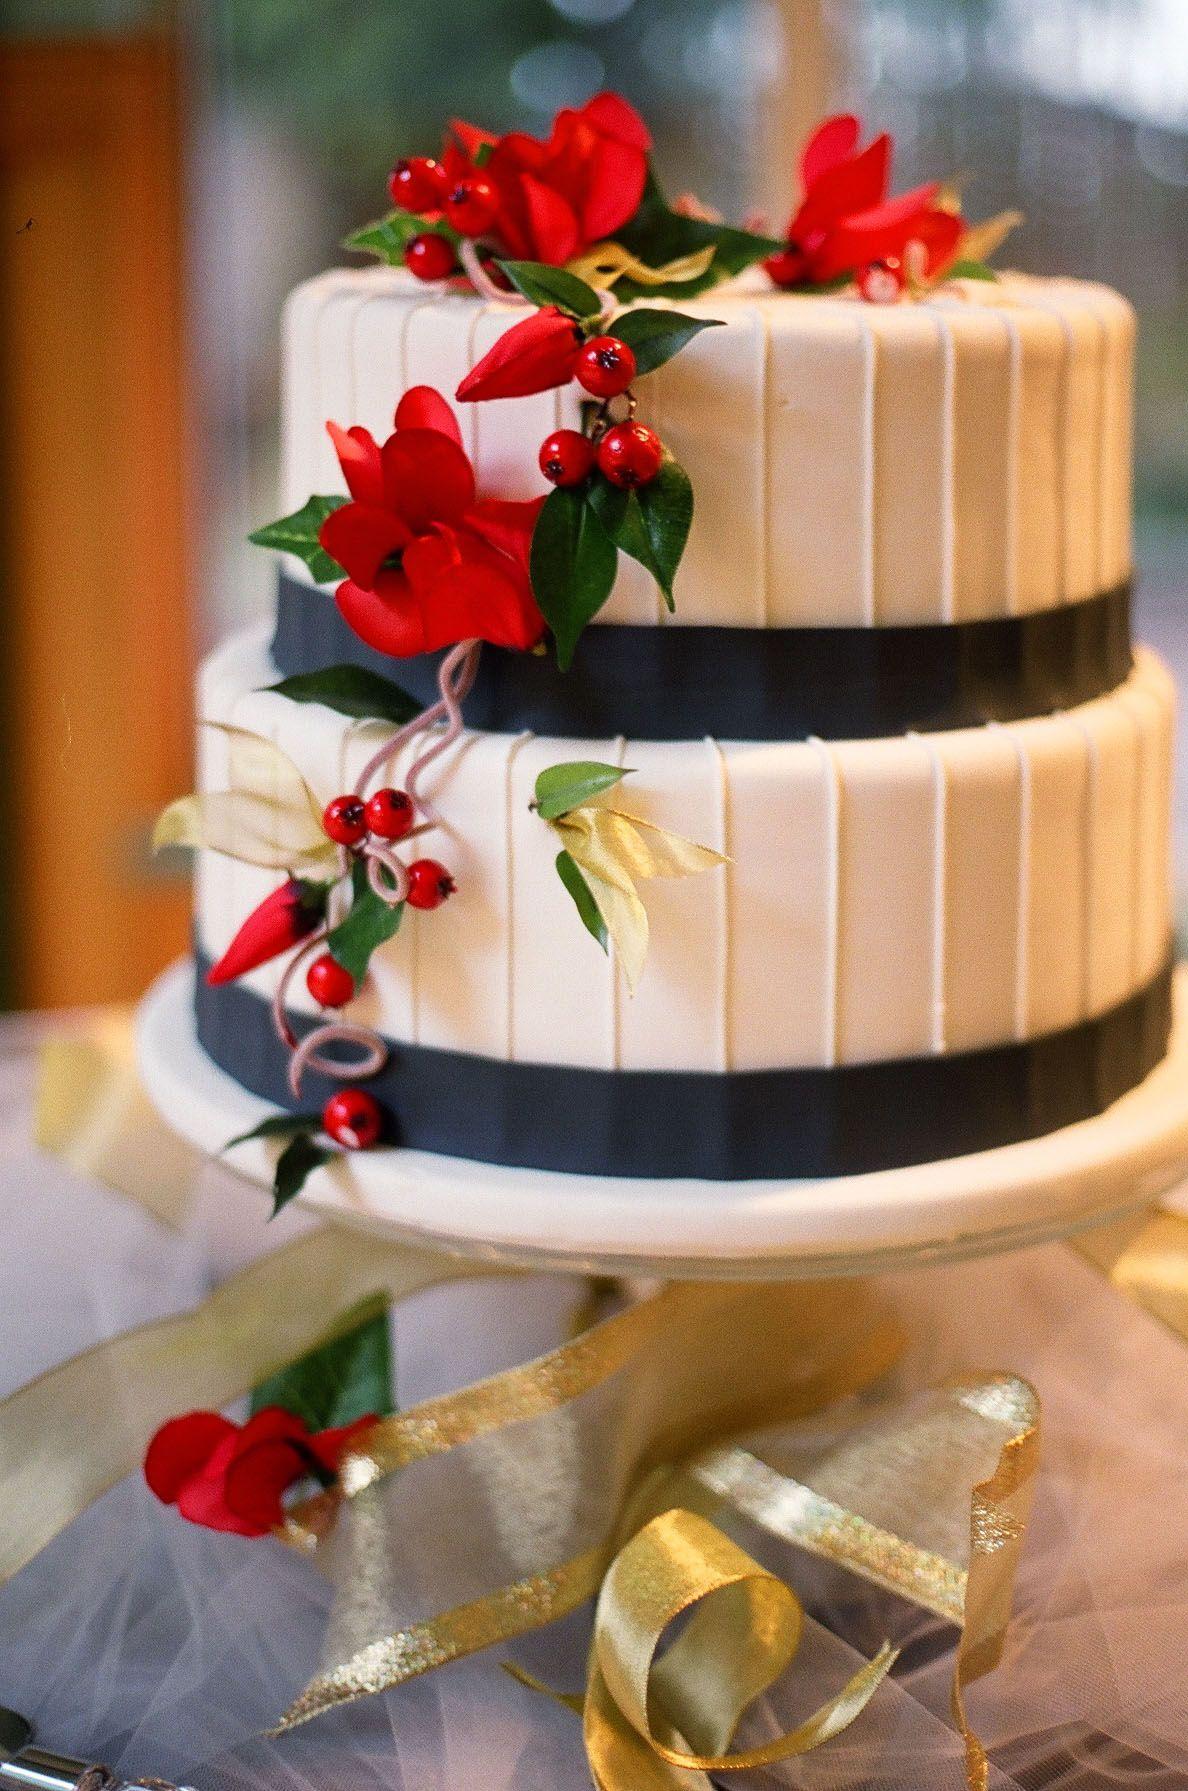 Wedding Cake sothisislove.ca | Wedding events, Table ...